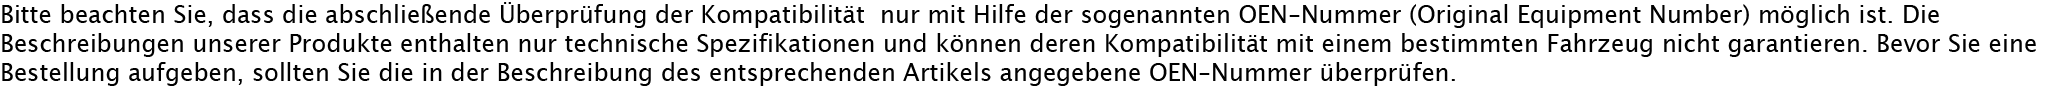 ATE 23914, 602749, 1K0 698 451 G, 3AA 698 451, 3C0 698 451 D Bremsbelagsatz, Scheibenbremse